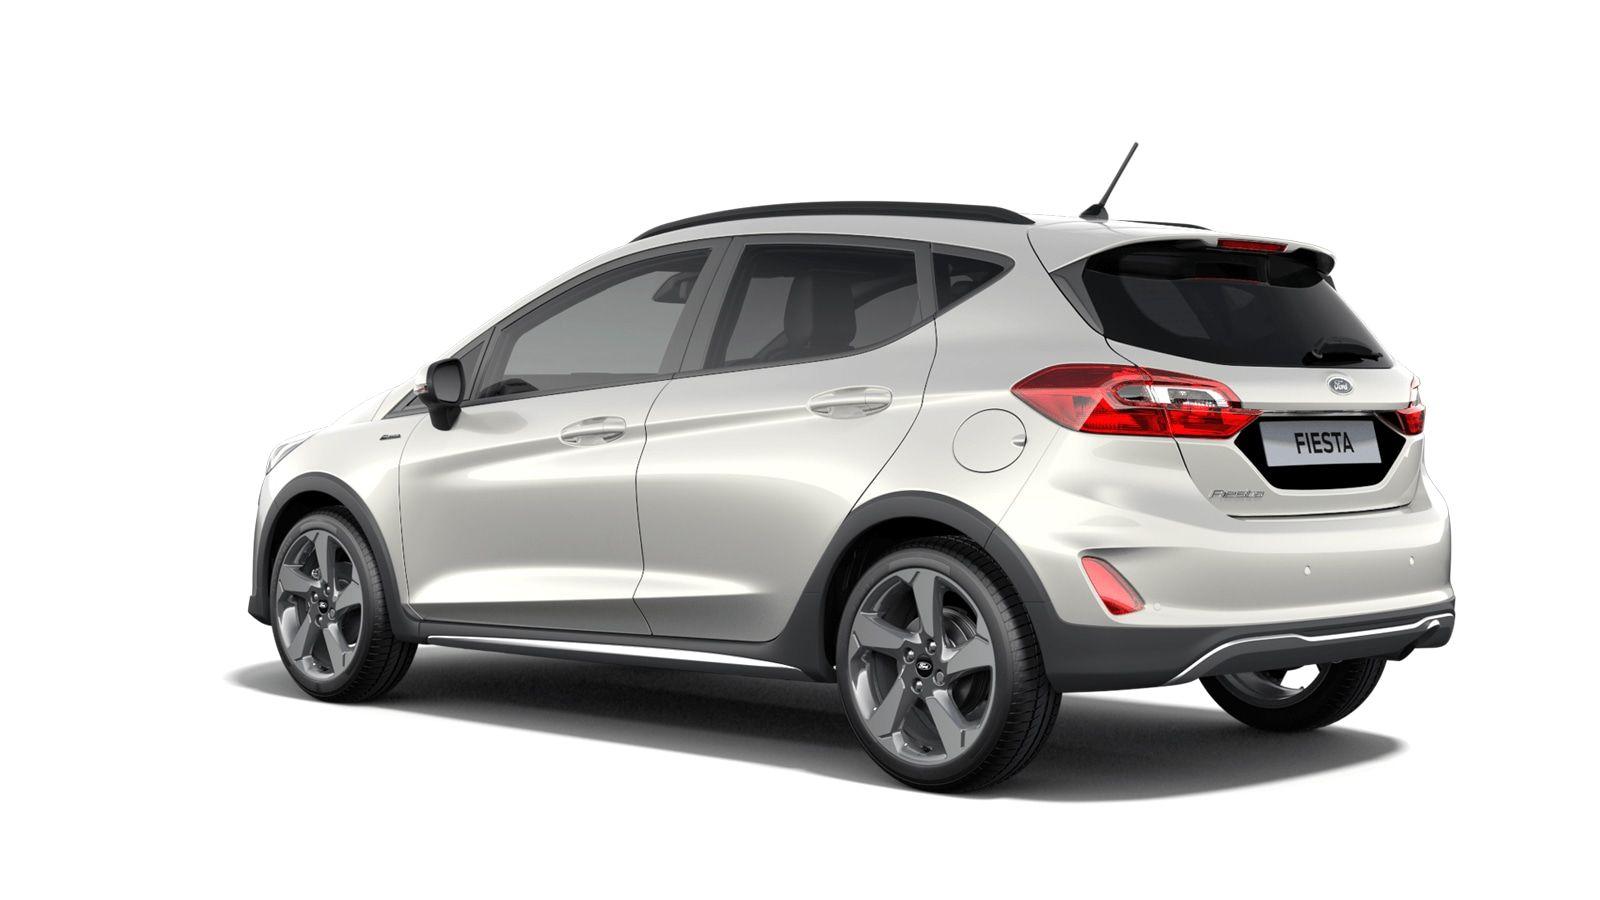 "Nieuw Ford All-new ford fiesta Active 1.0i EcoBoost mHEV 125ps / 92kW M6 - 5d JKV - Speciale metaalkleur ""Metropolis White"" 2"